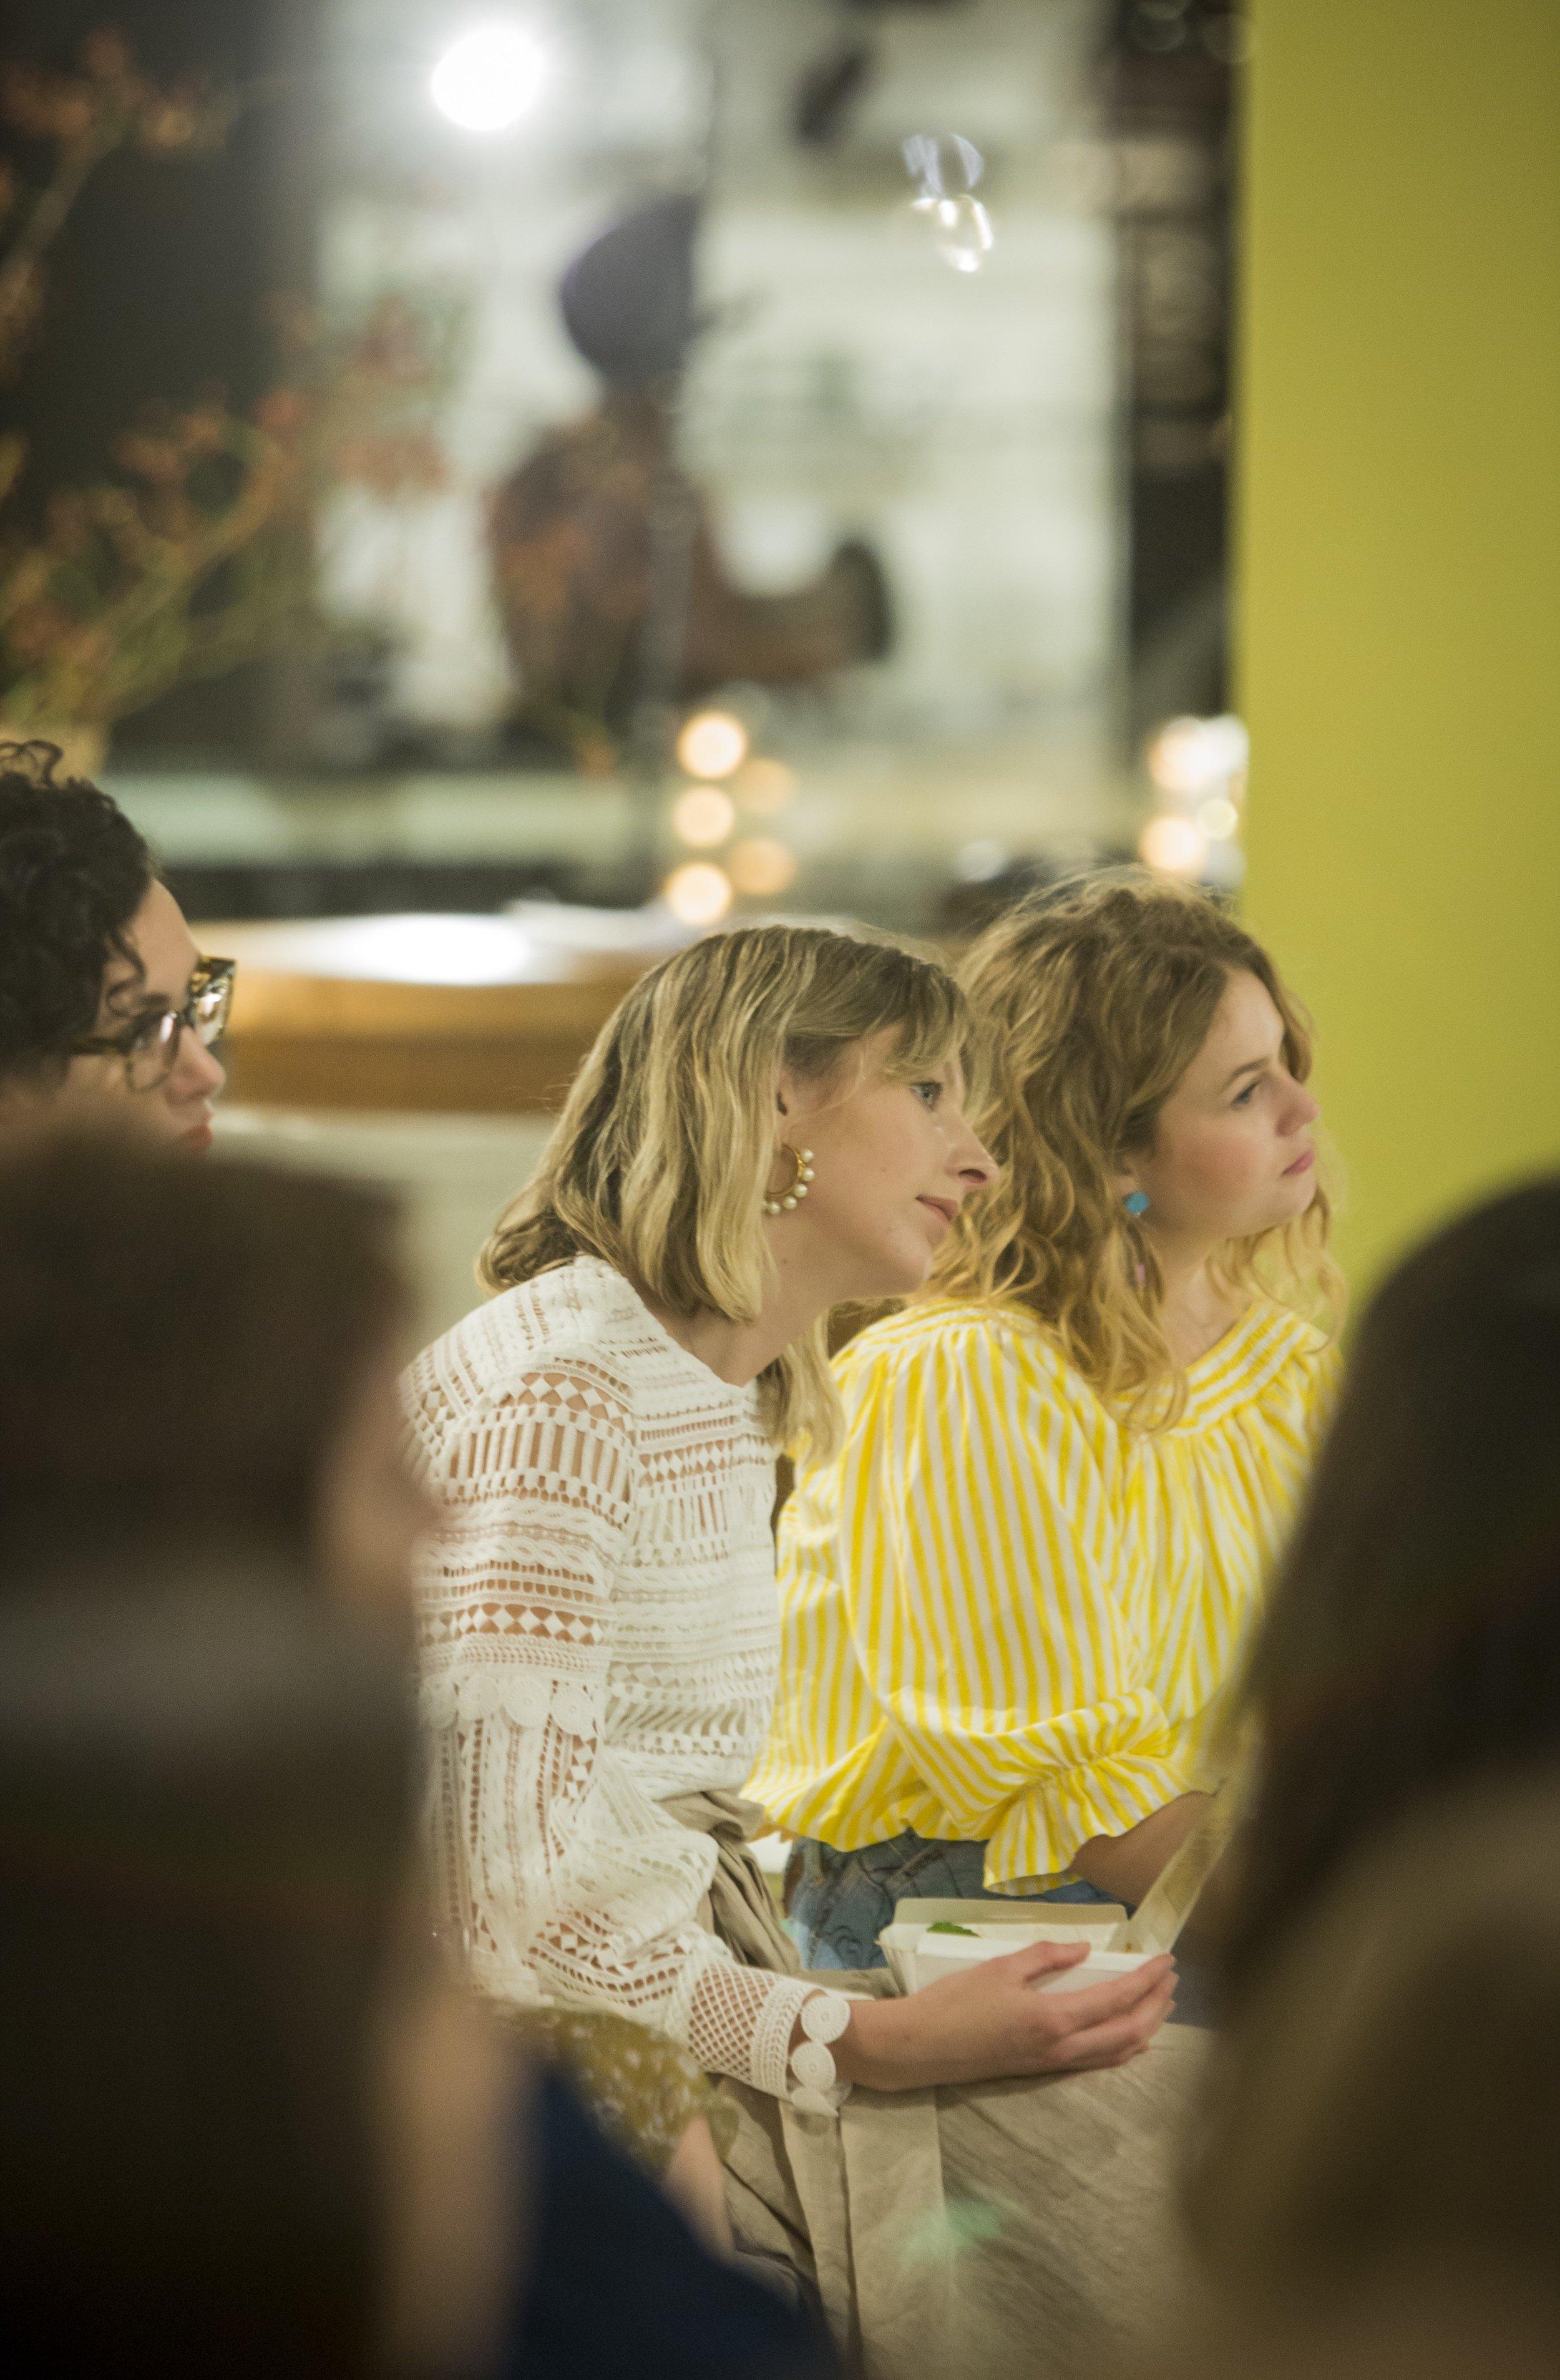 Artichoke Night School, Photographer: Ray Cash, Interior Design, Brisbane, Queensland